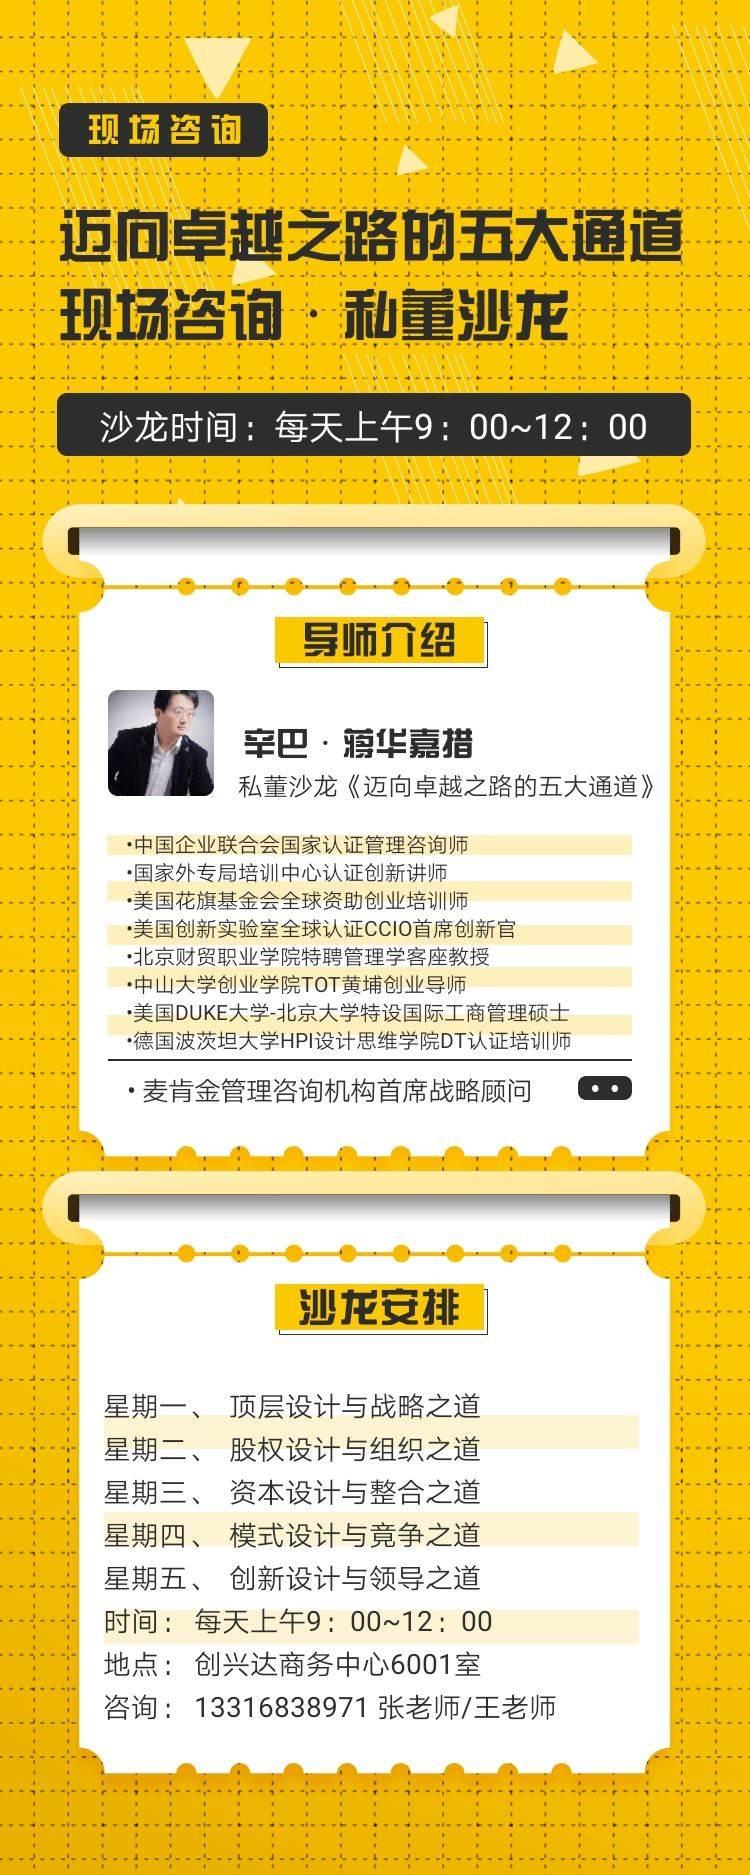 http://www.huodongxing.com/file/20141126/7551790302659/563599062132007.jpg